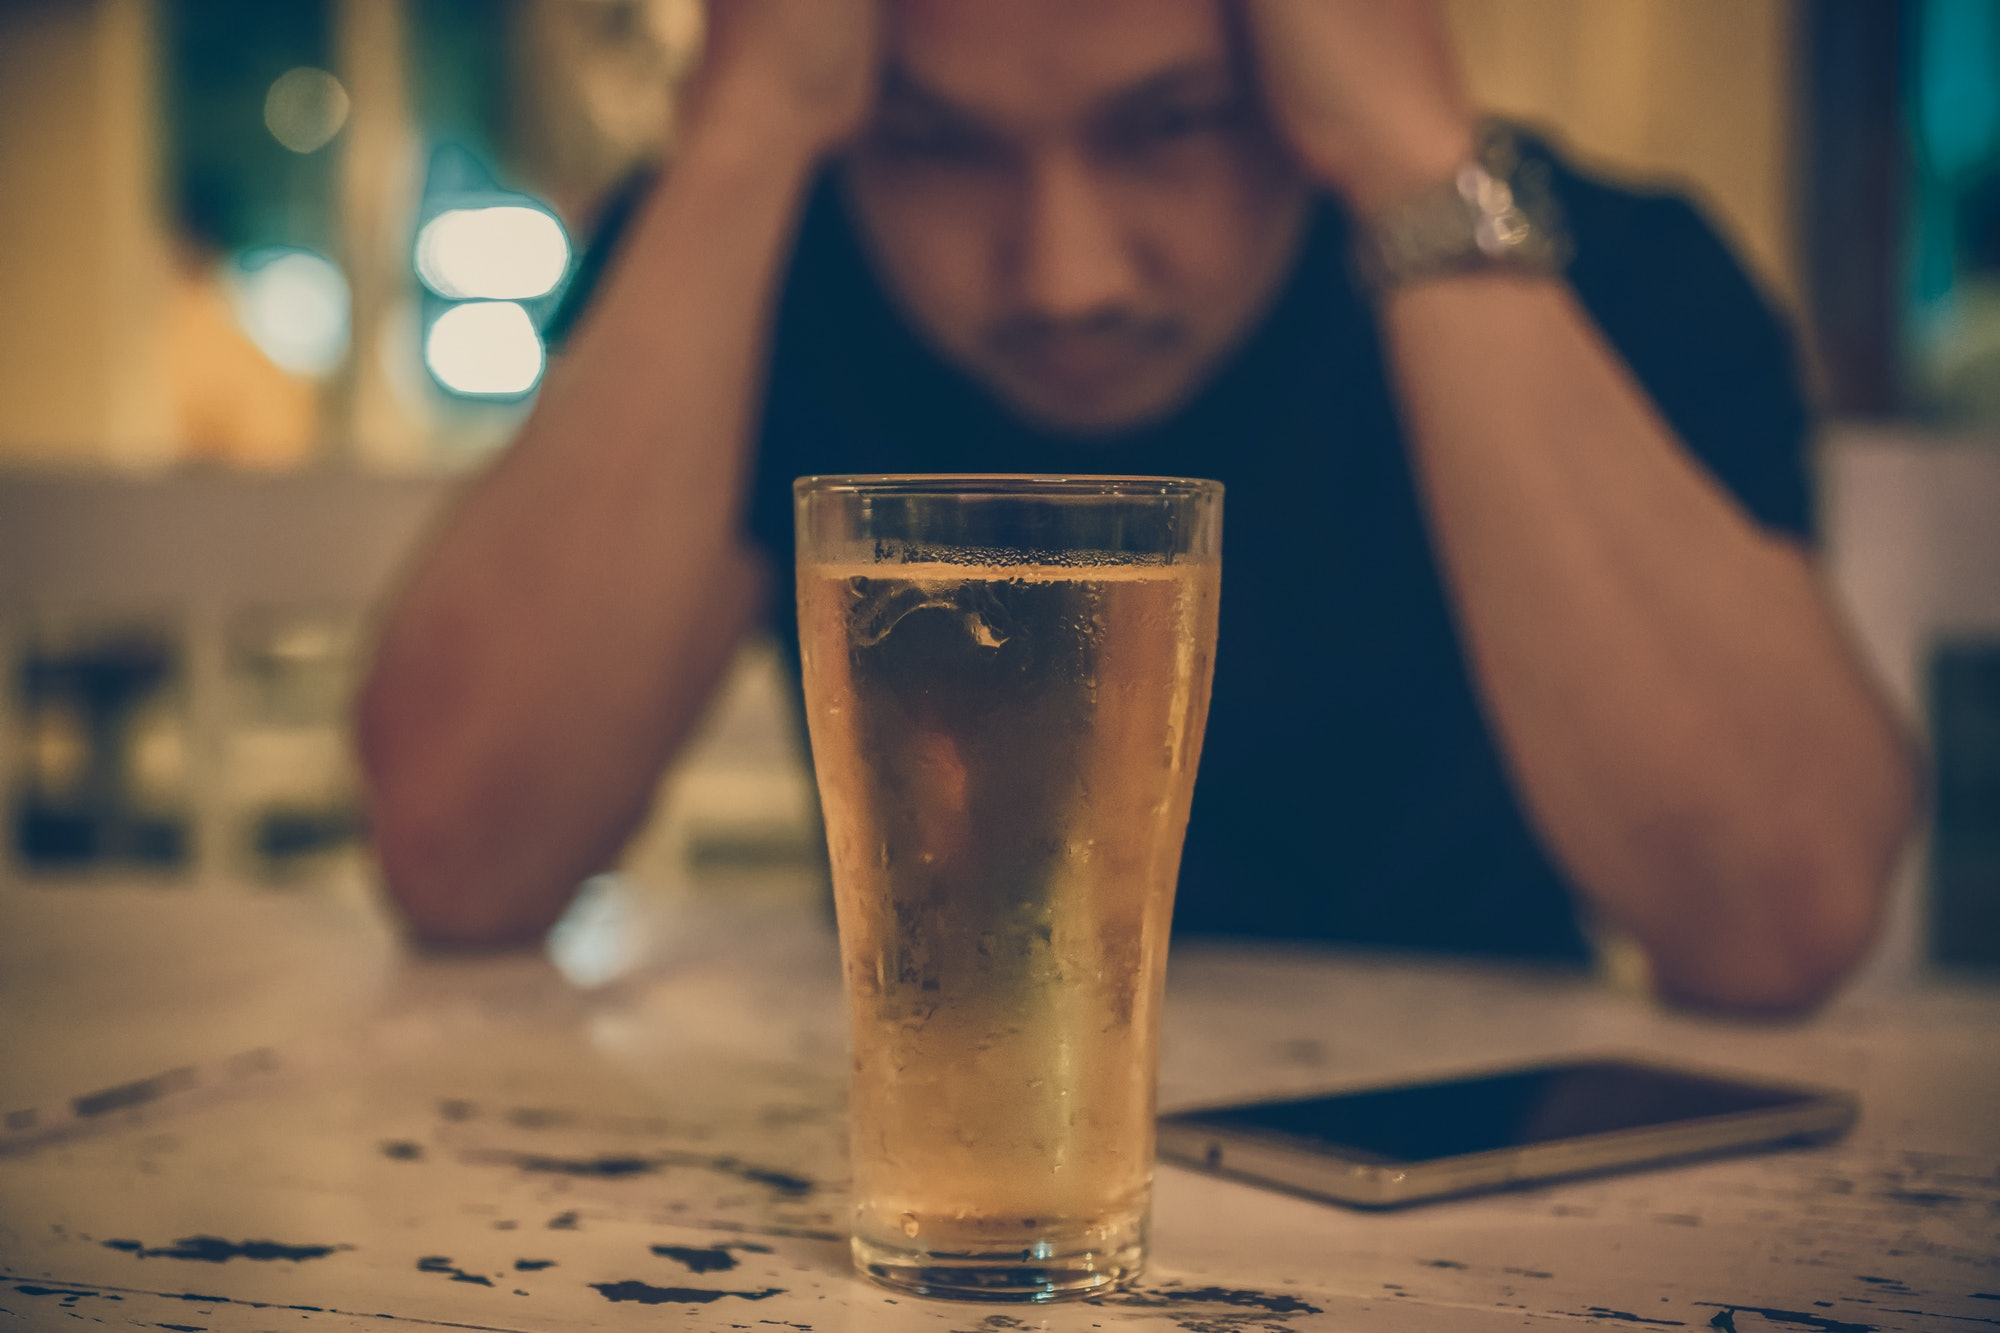 alcohol abuse, alcohol